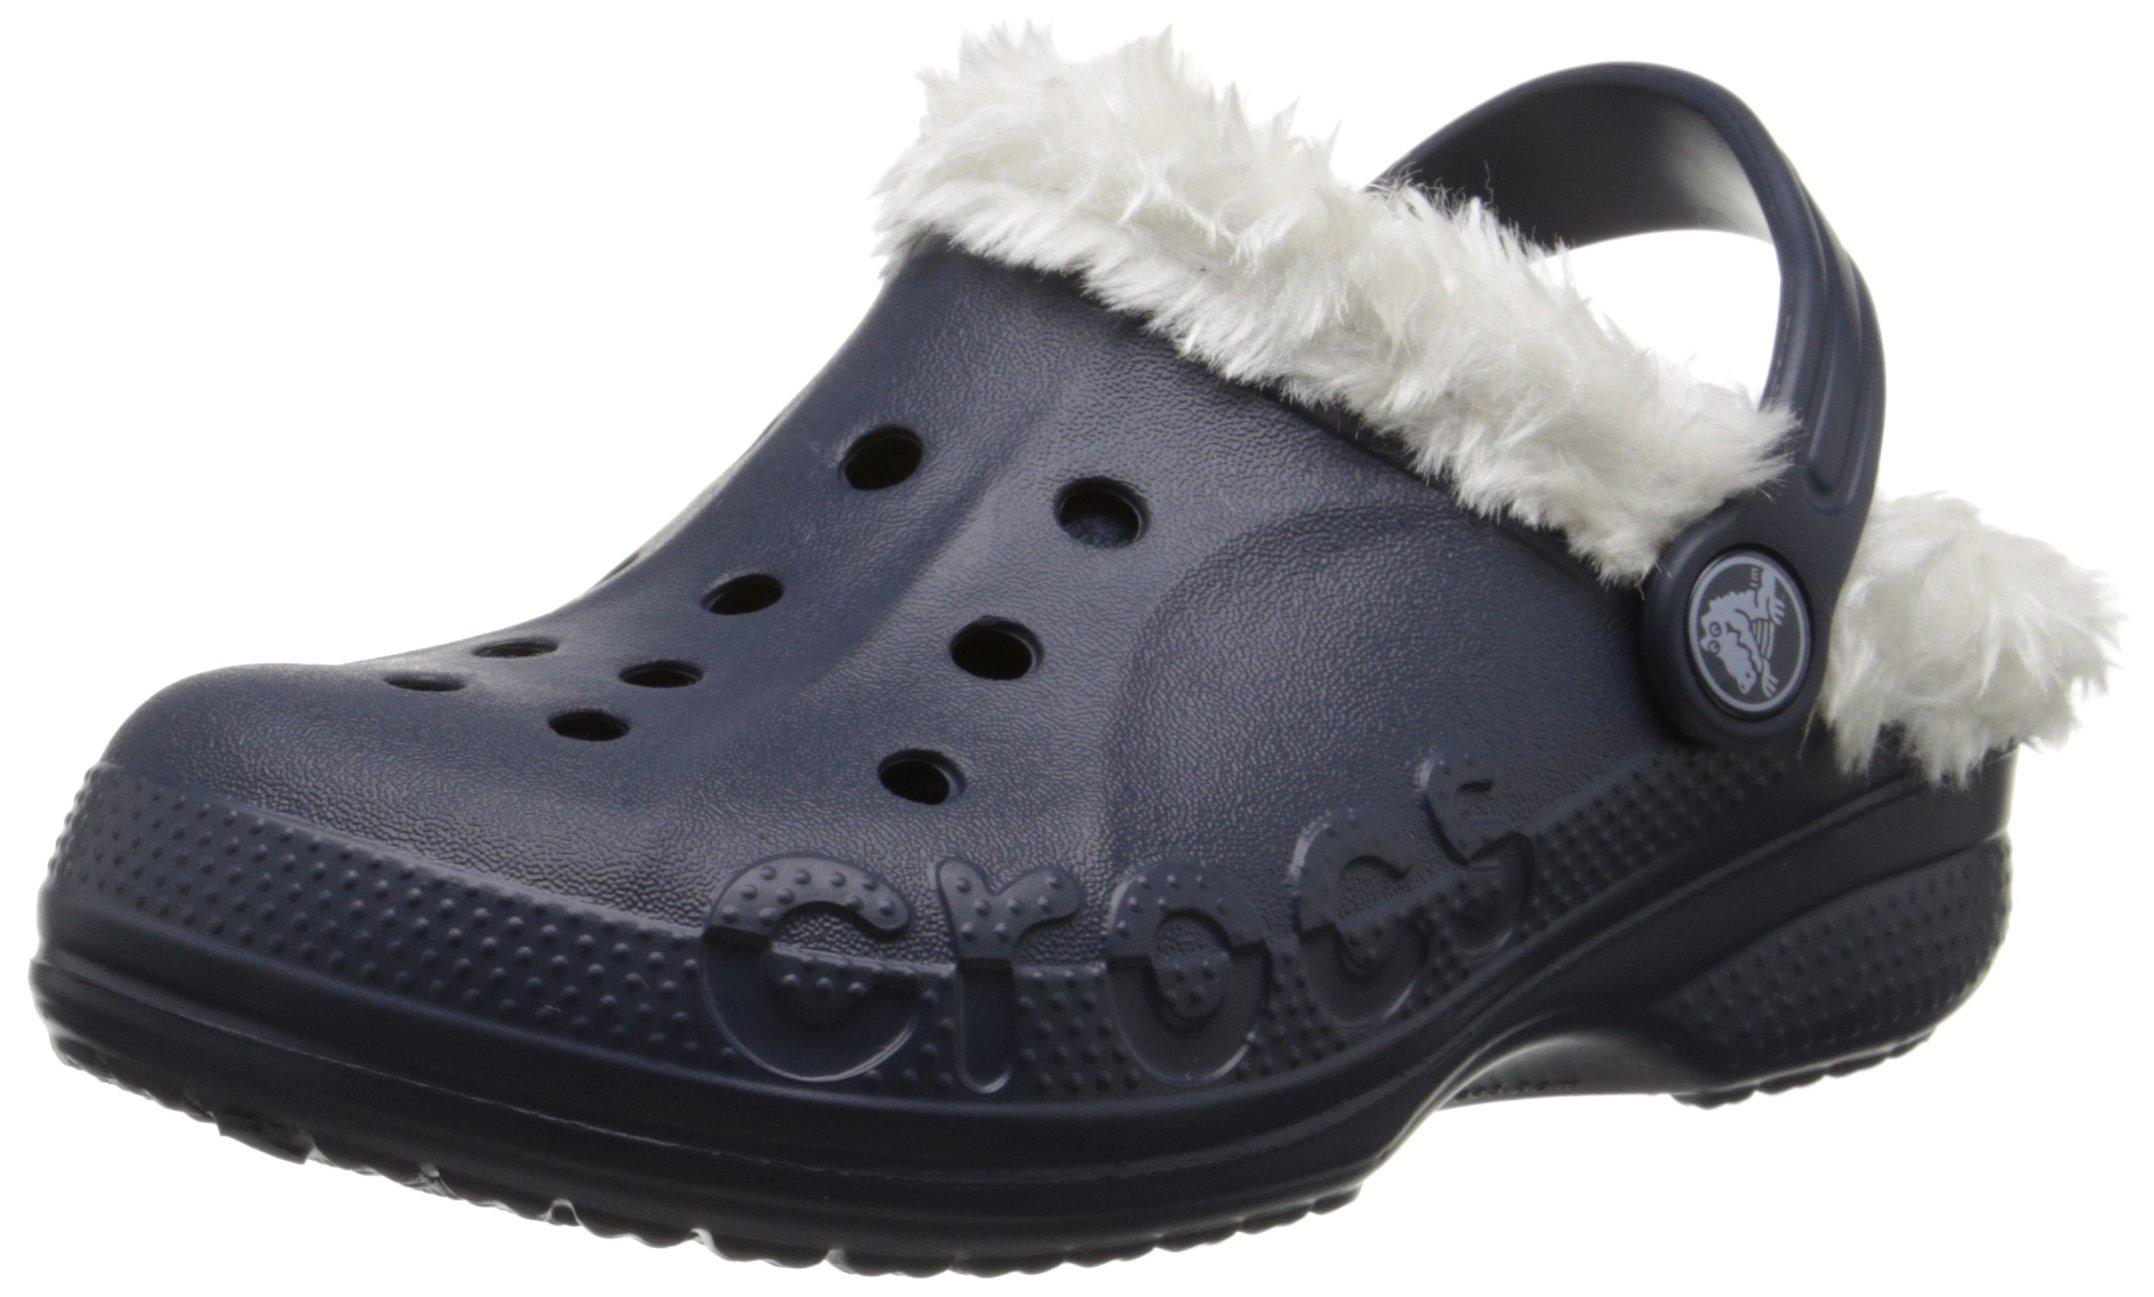 crocs Baya Plush Lined Clog (Toddler/Little Kid), Navy/Oatmeal, 12-13 M US Little Kid by Crocs